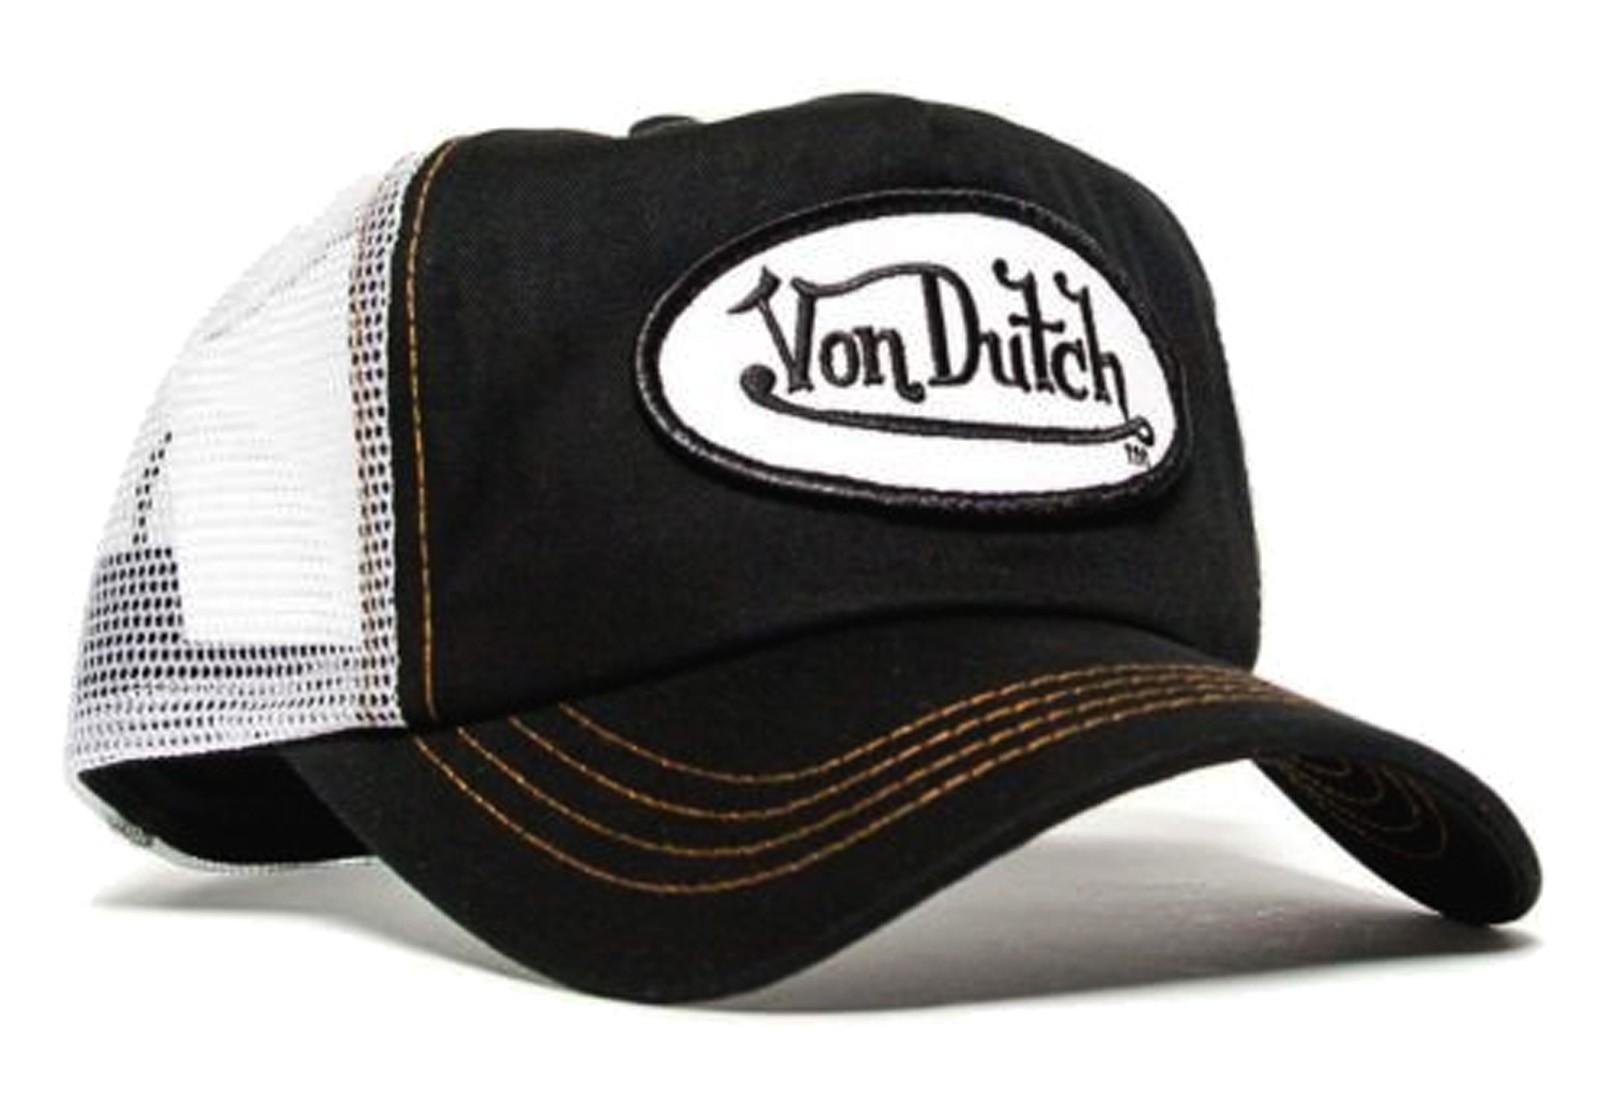 Von Dutch - Classic Black/White Mesh Trucker Cap